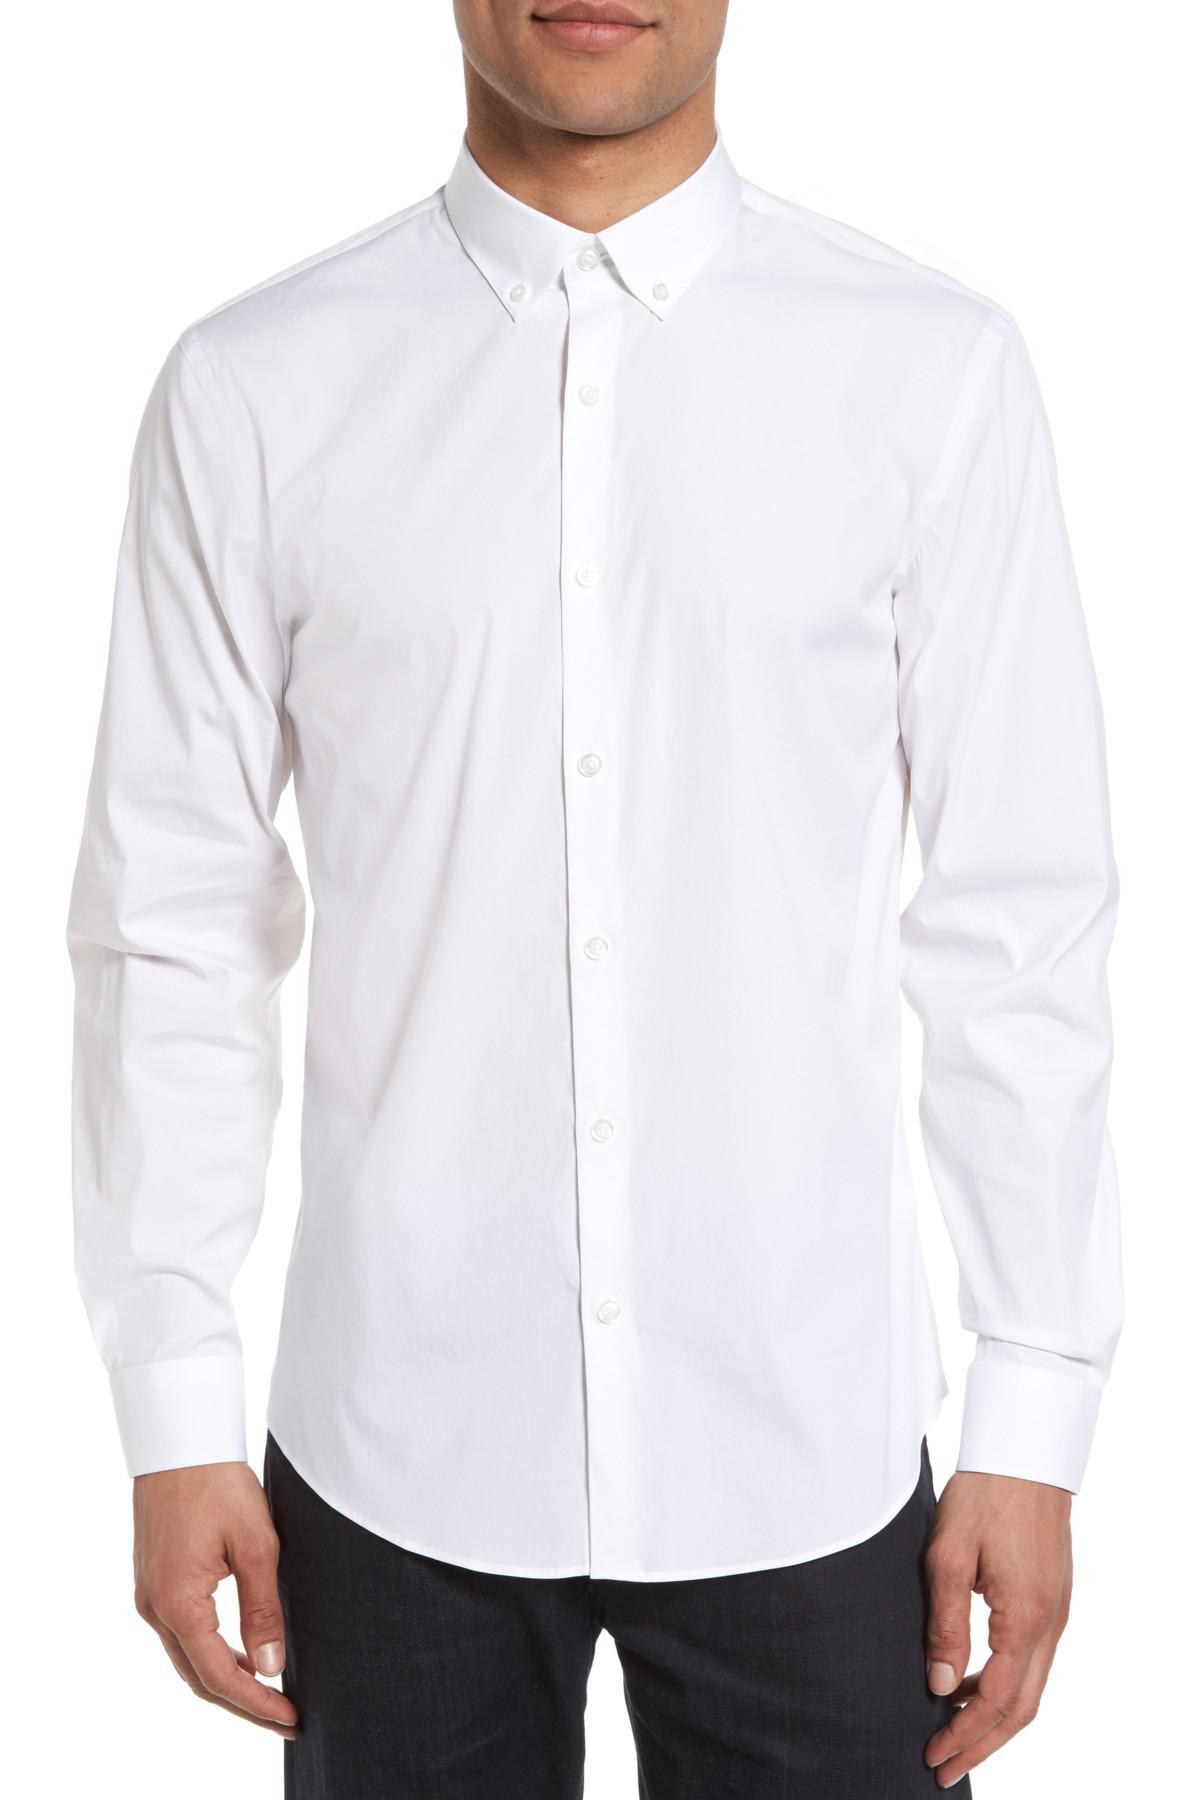 Calibrate Trim Fit Slash Pocket Sport Shirt Outlet Online 7LIK2Xq